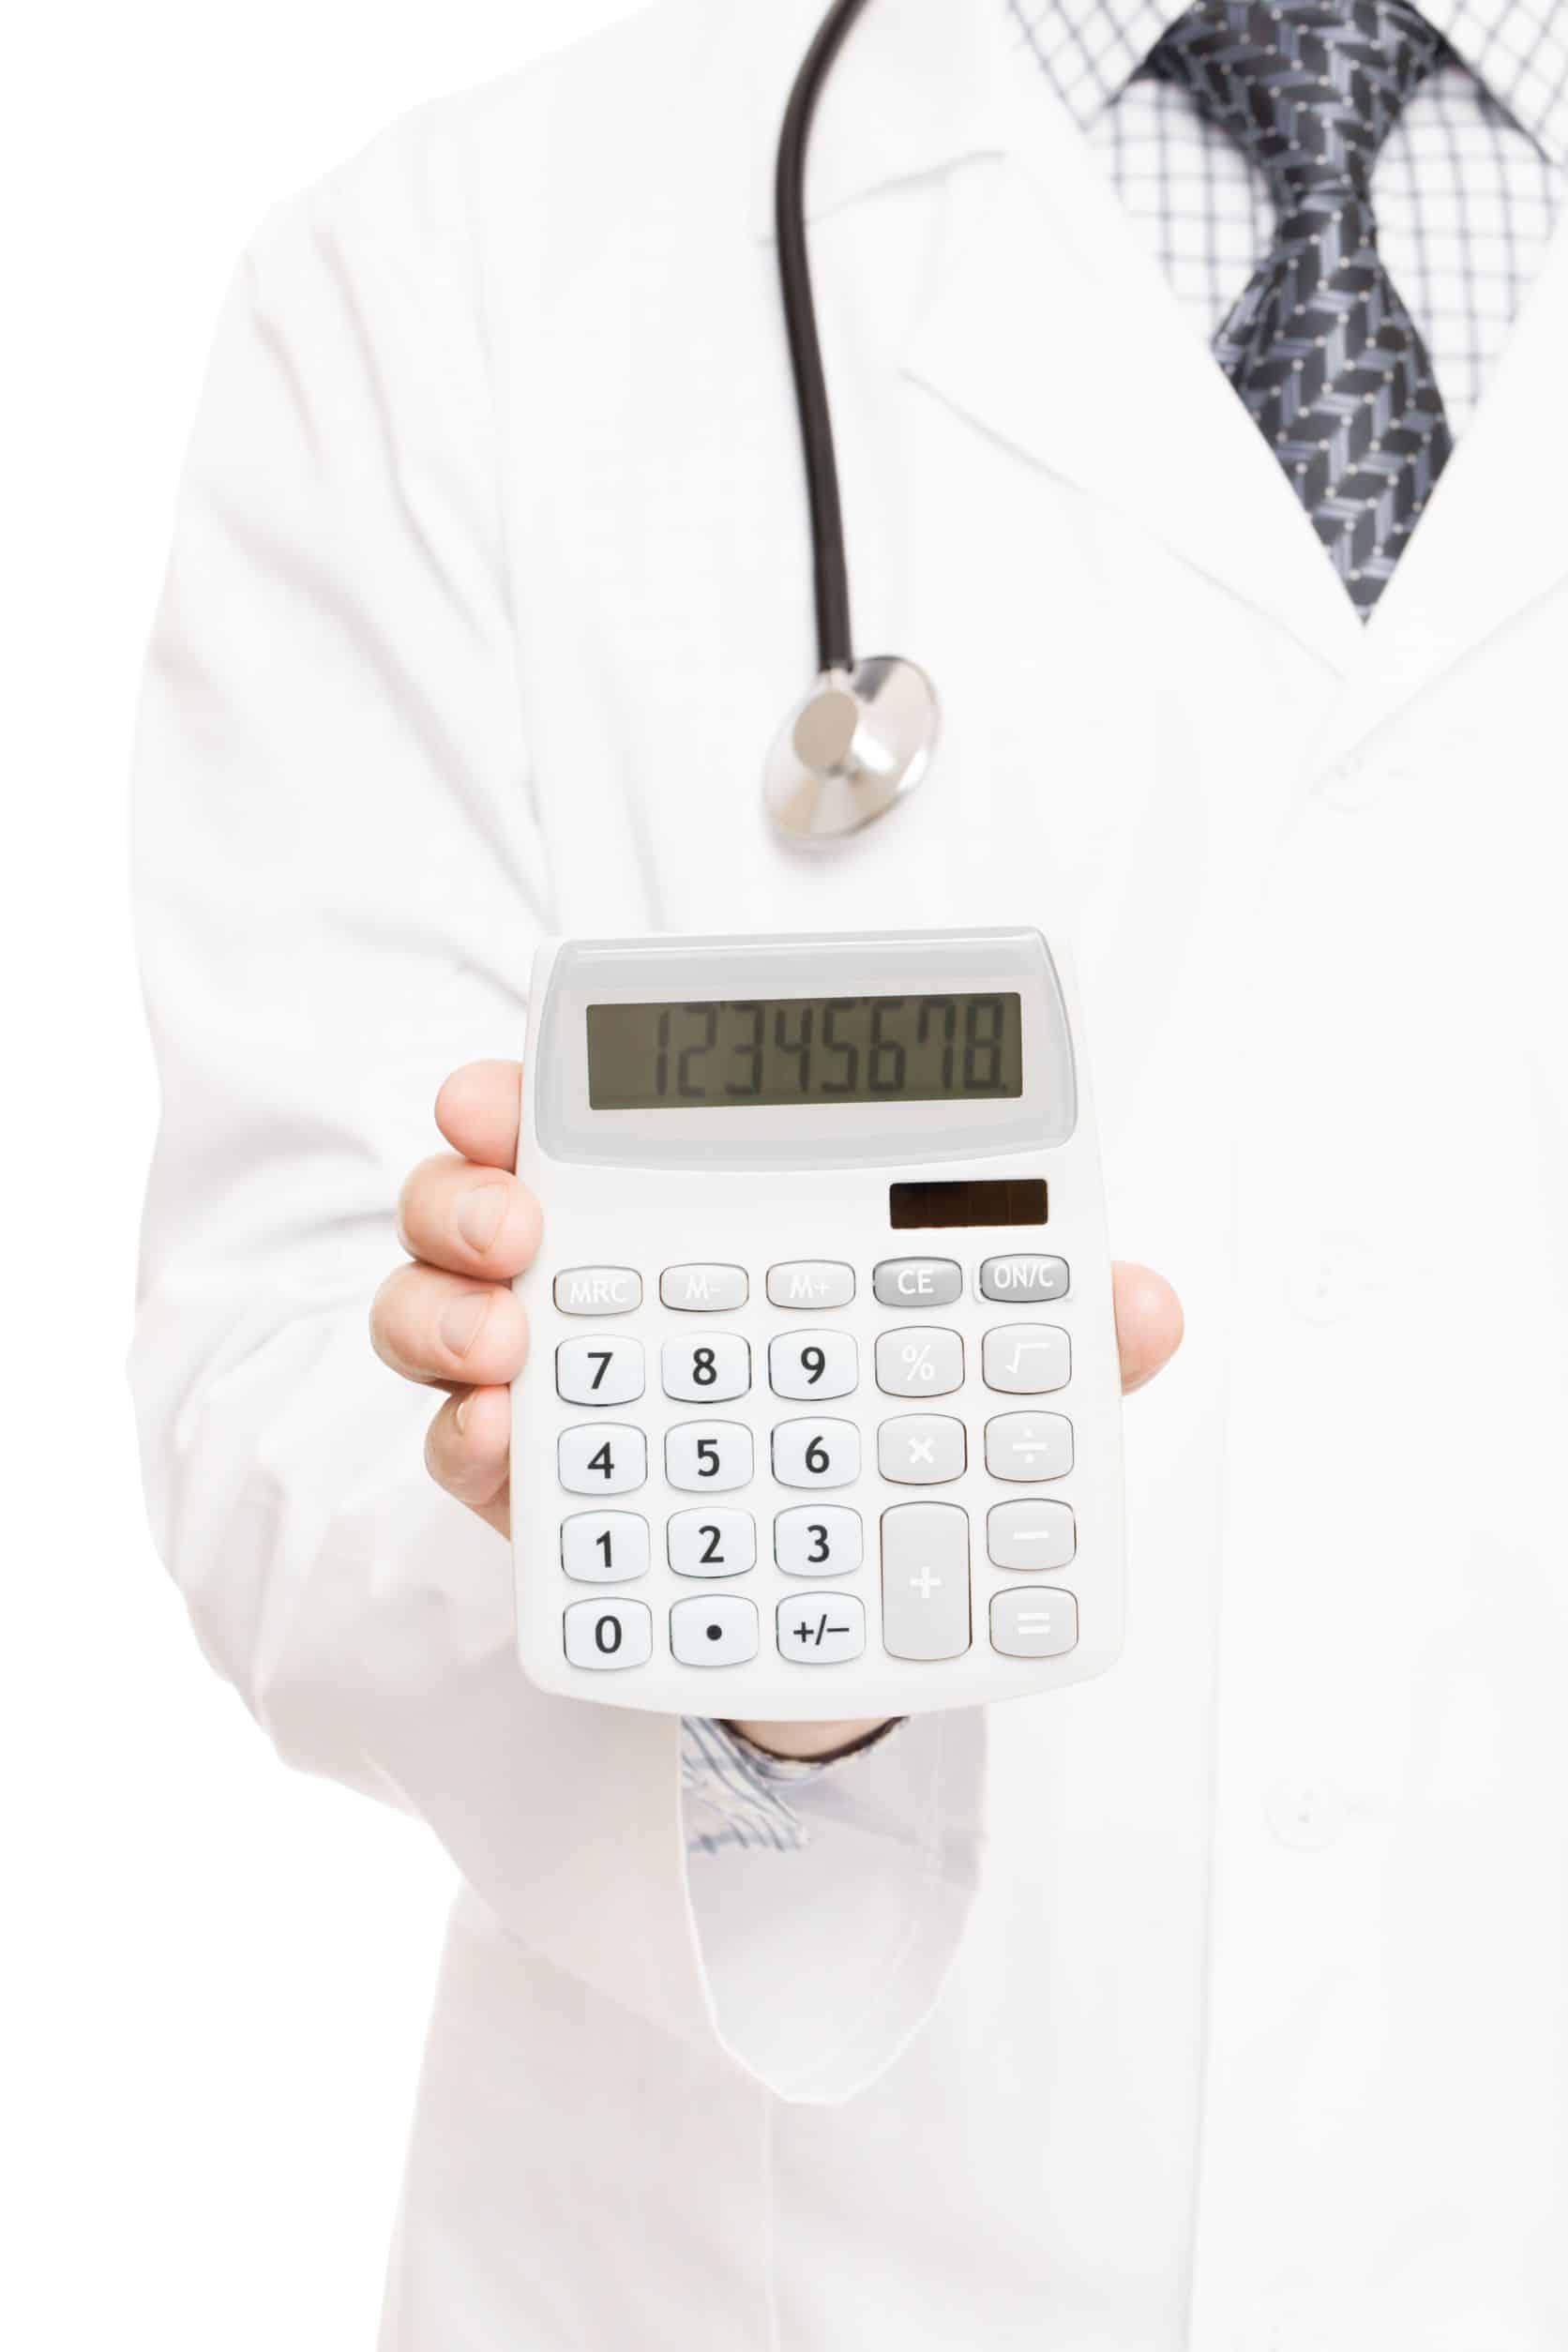 Unexpected Medical Bills